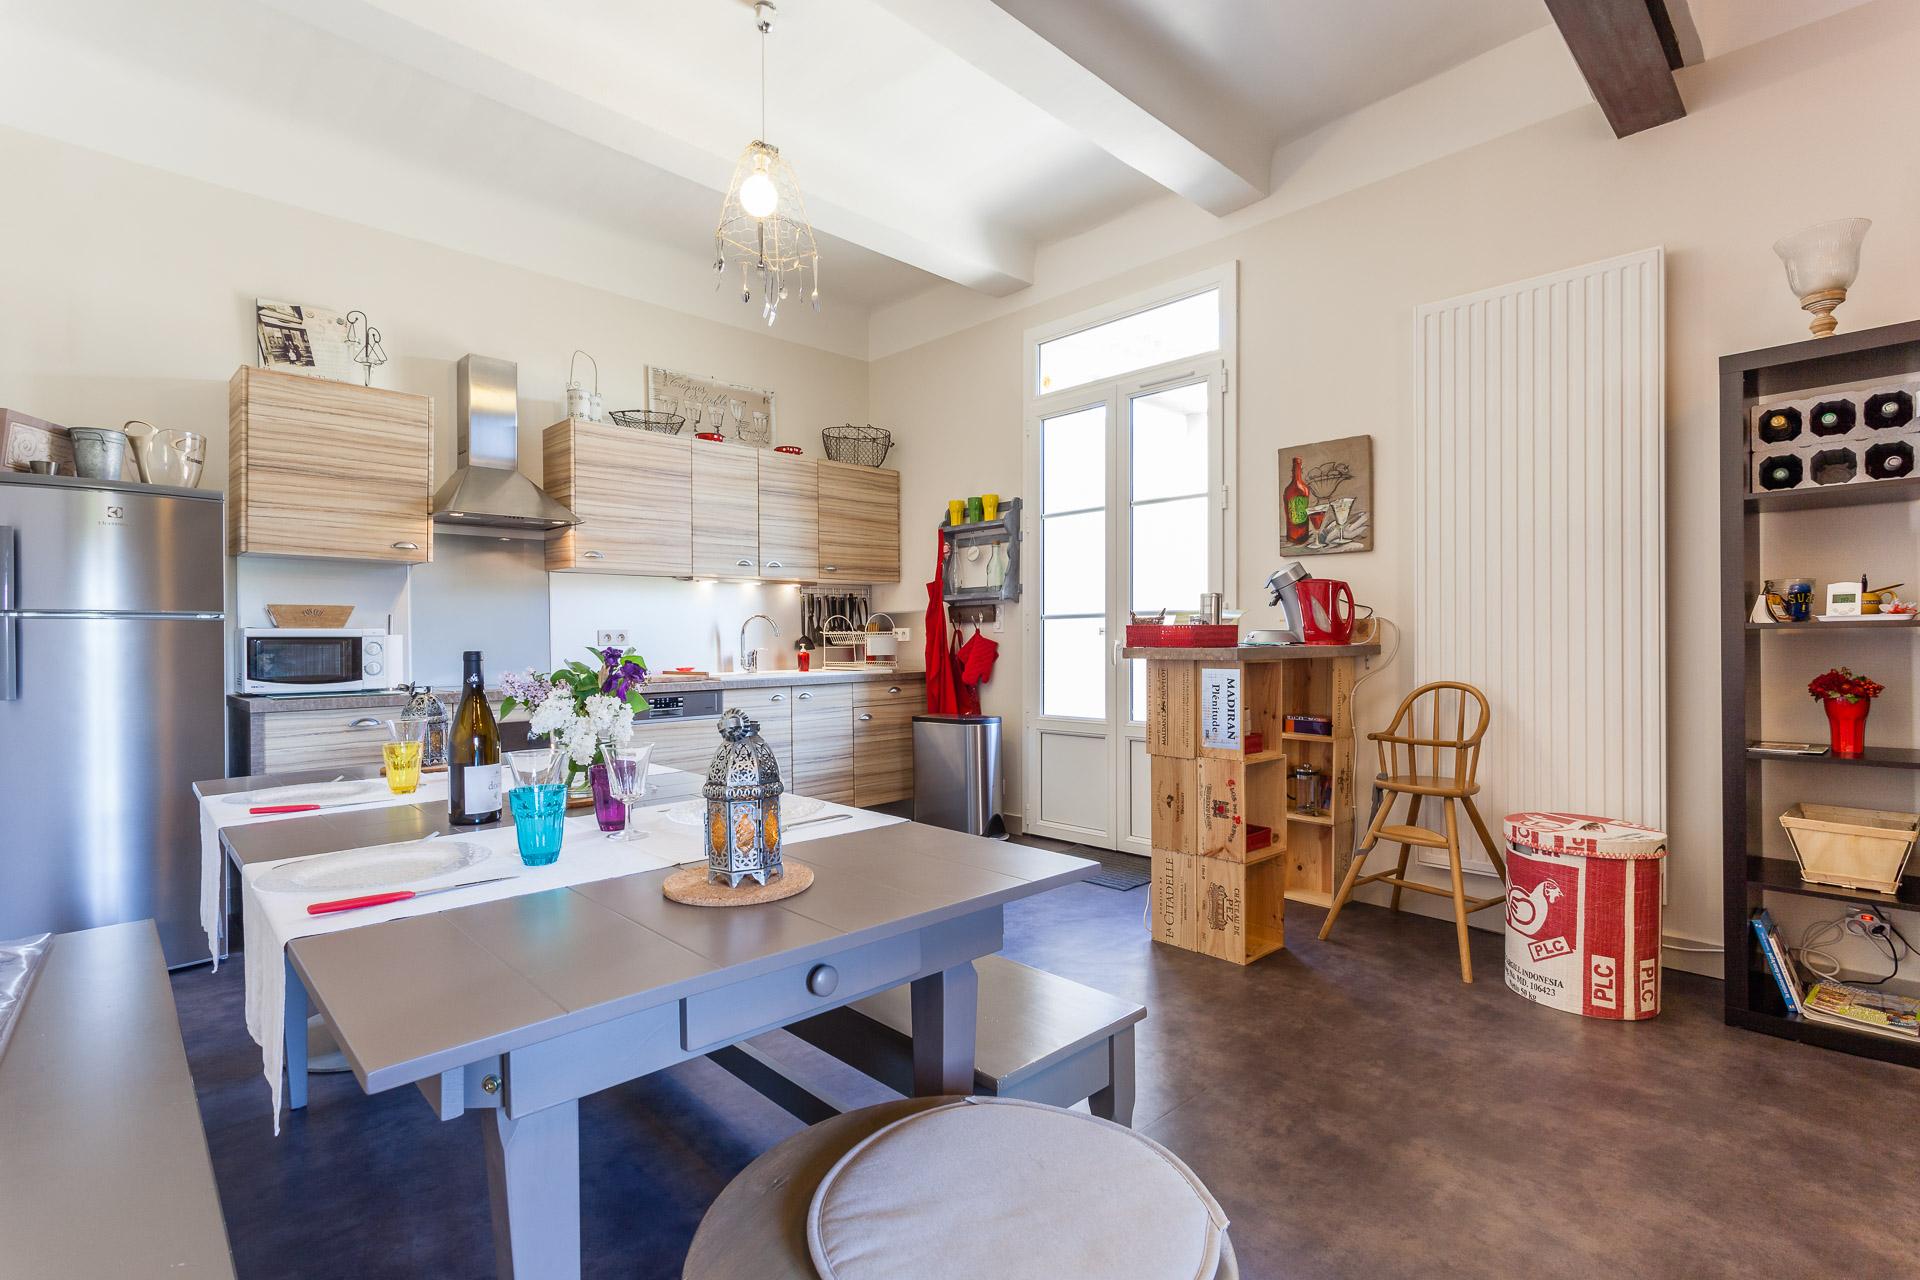 Salon et cuisine villa de luxe louer sur koh samui salon for Cuisine ouverte villa